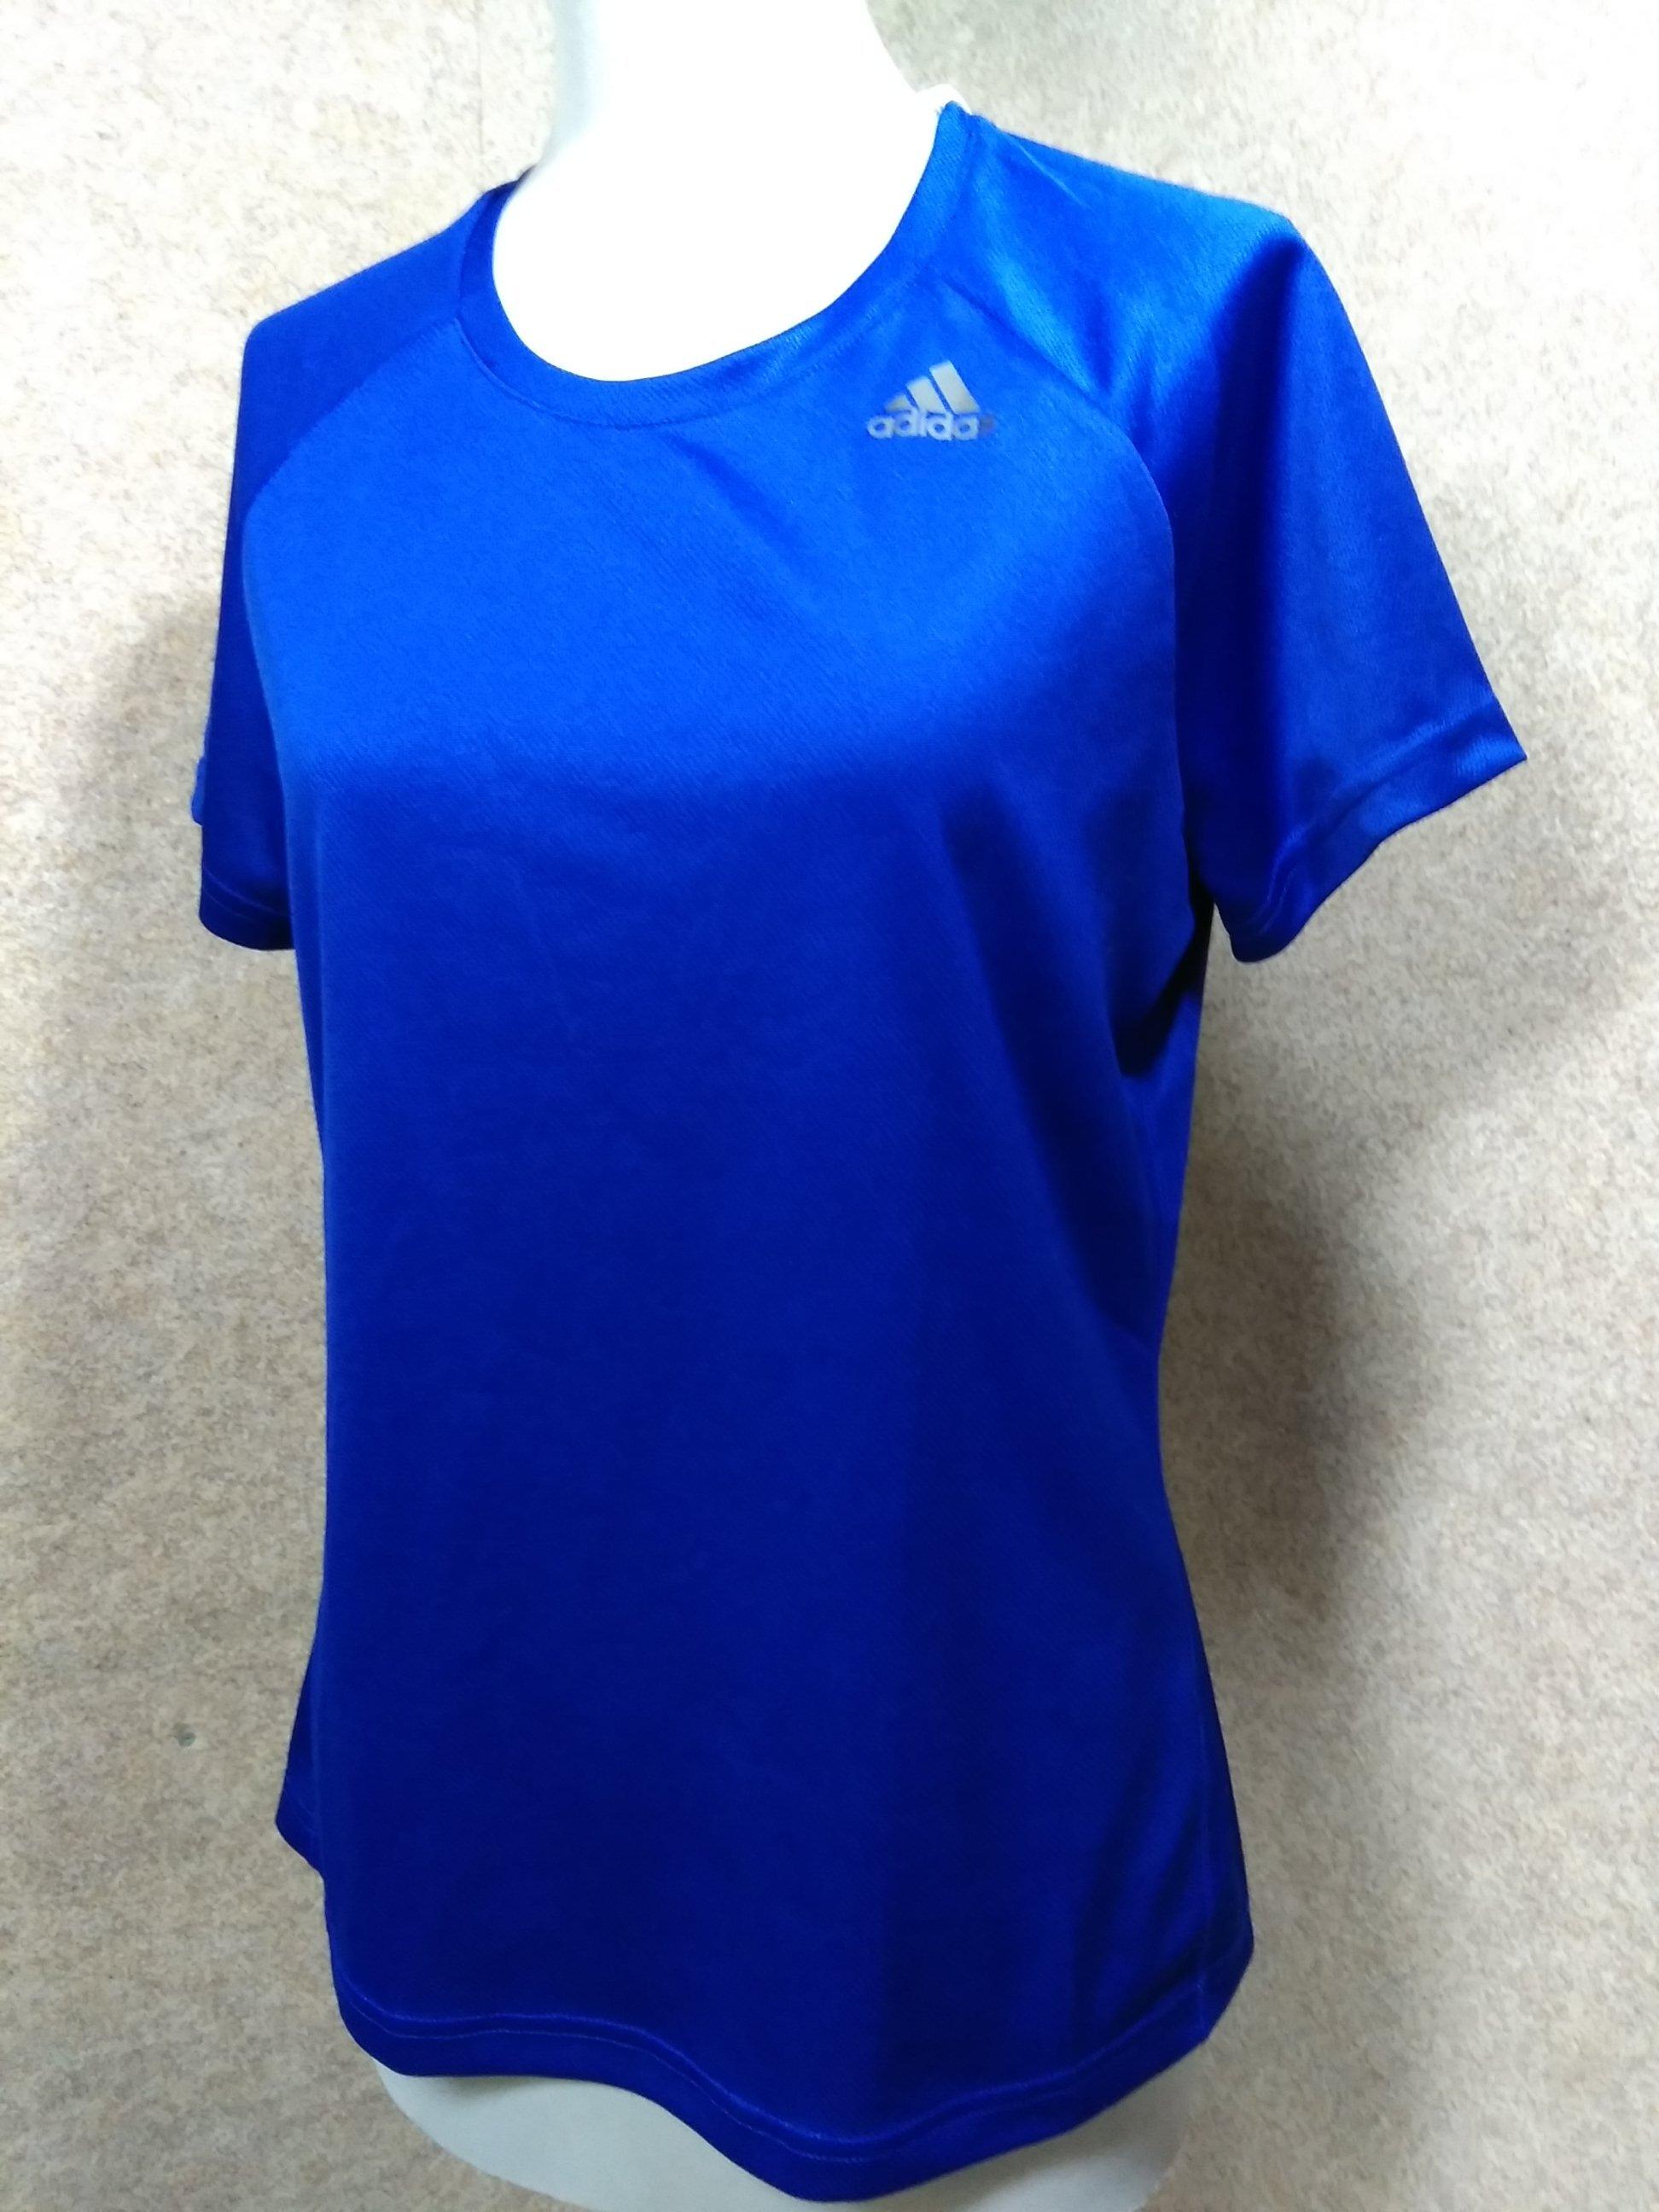 adidas アディダス Tシャツ サイズOT 青 u1257a